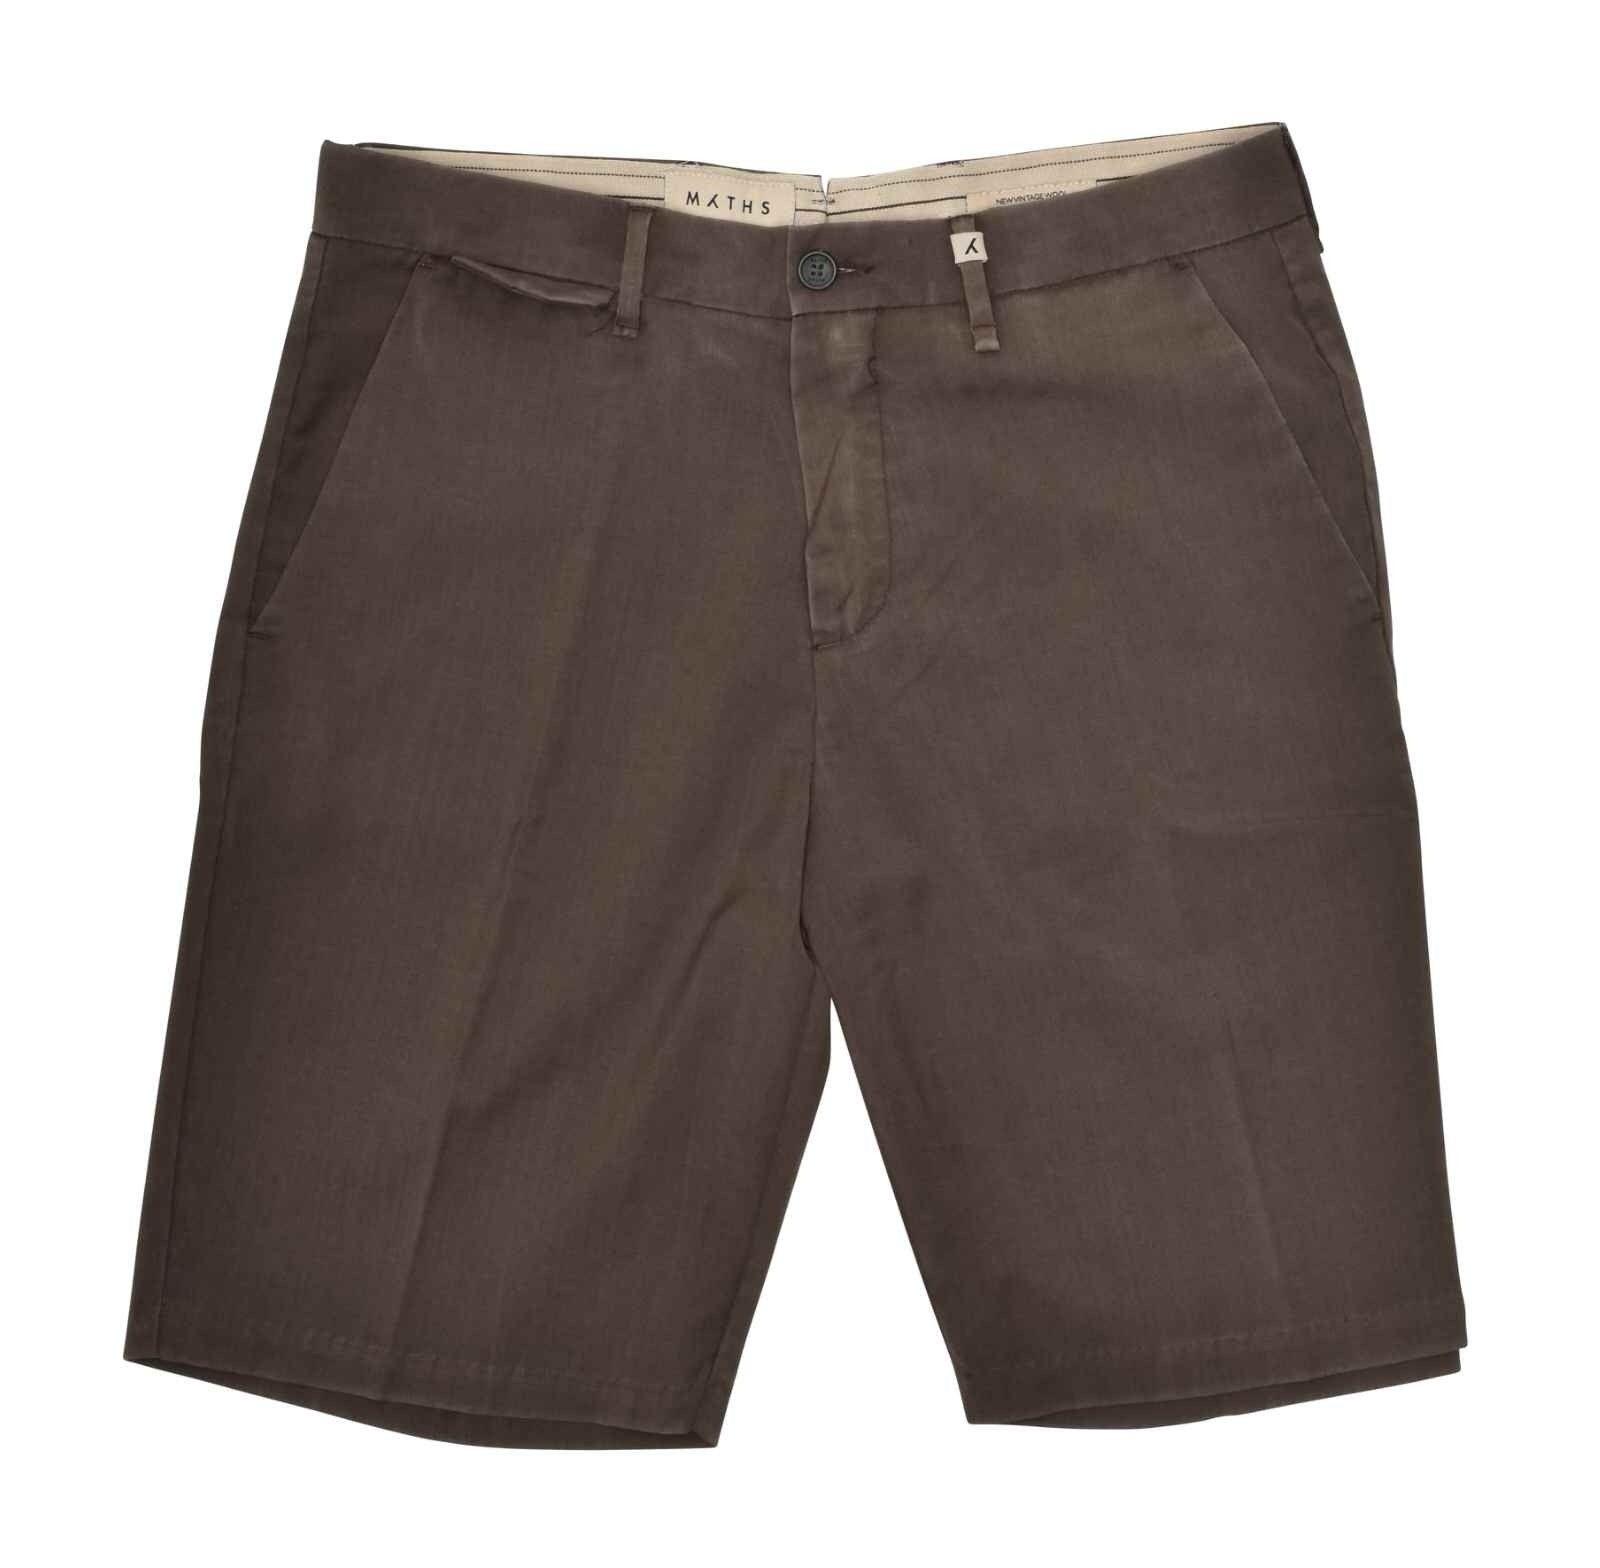 MYTHS - Herren Shorts - Short Trousers - Mocca